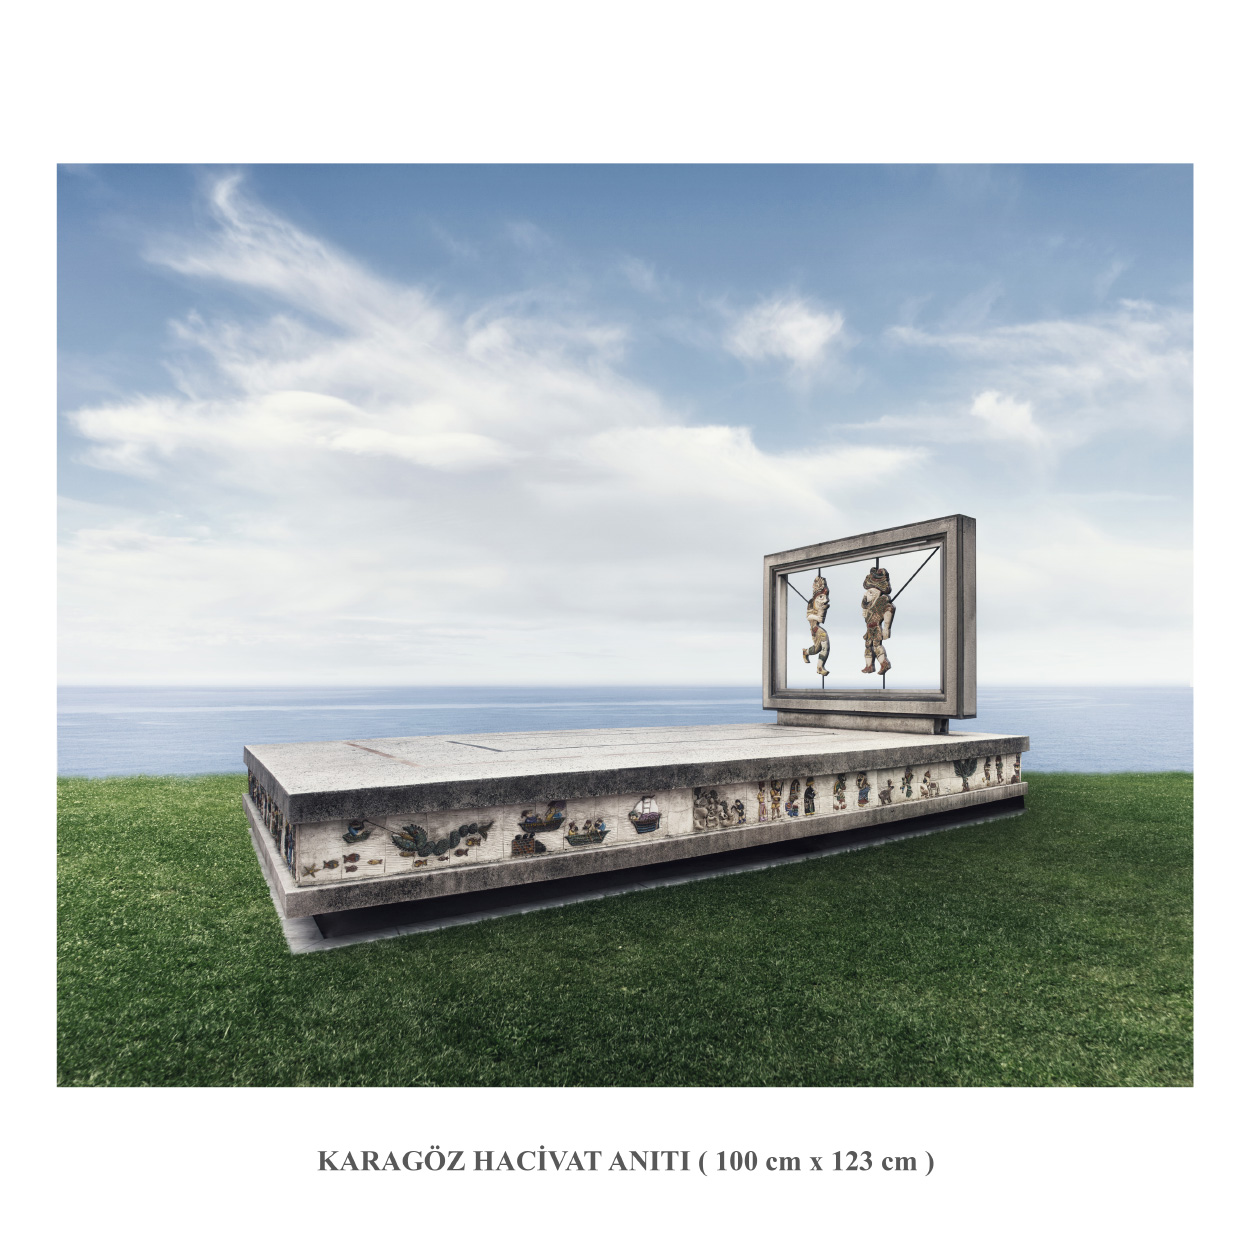 Karagöz Hacivat Anıtı copy